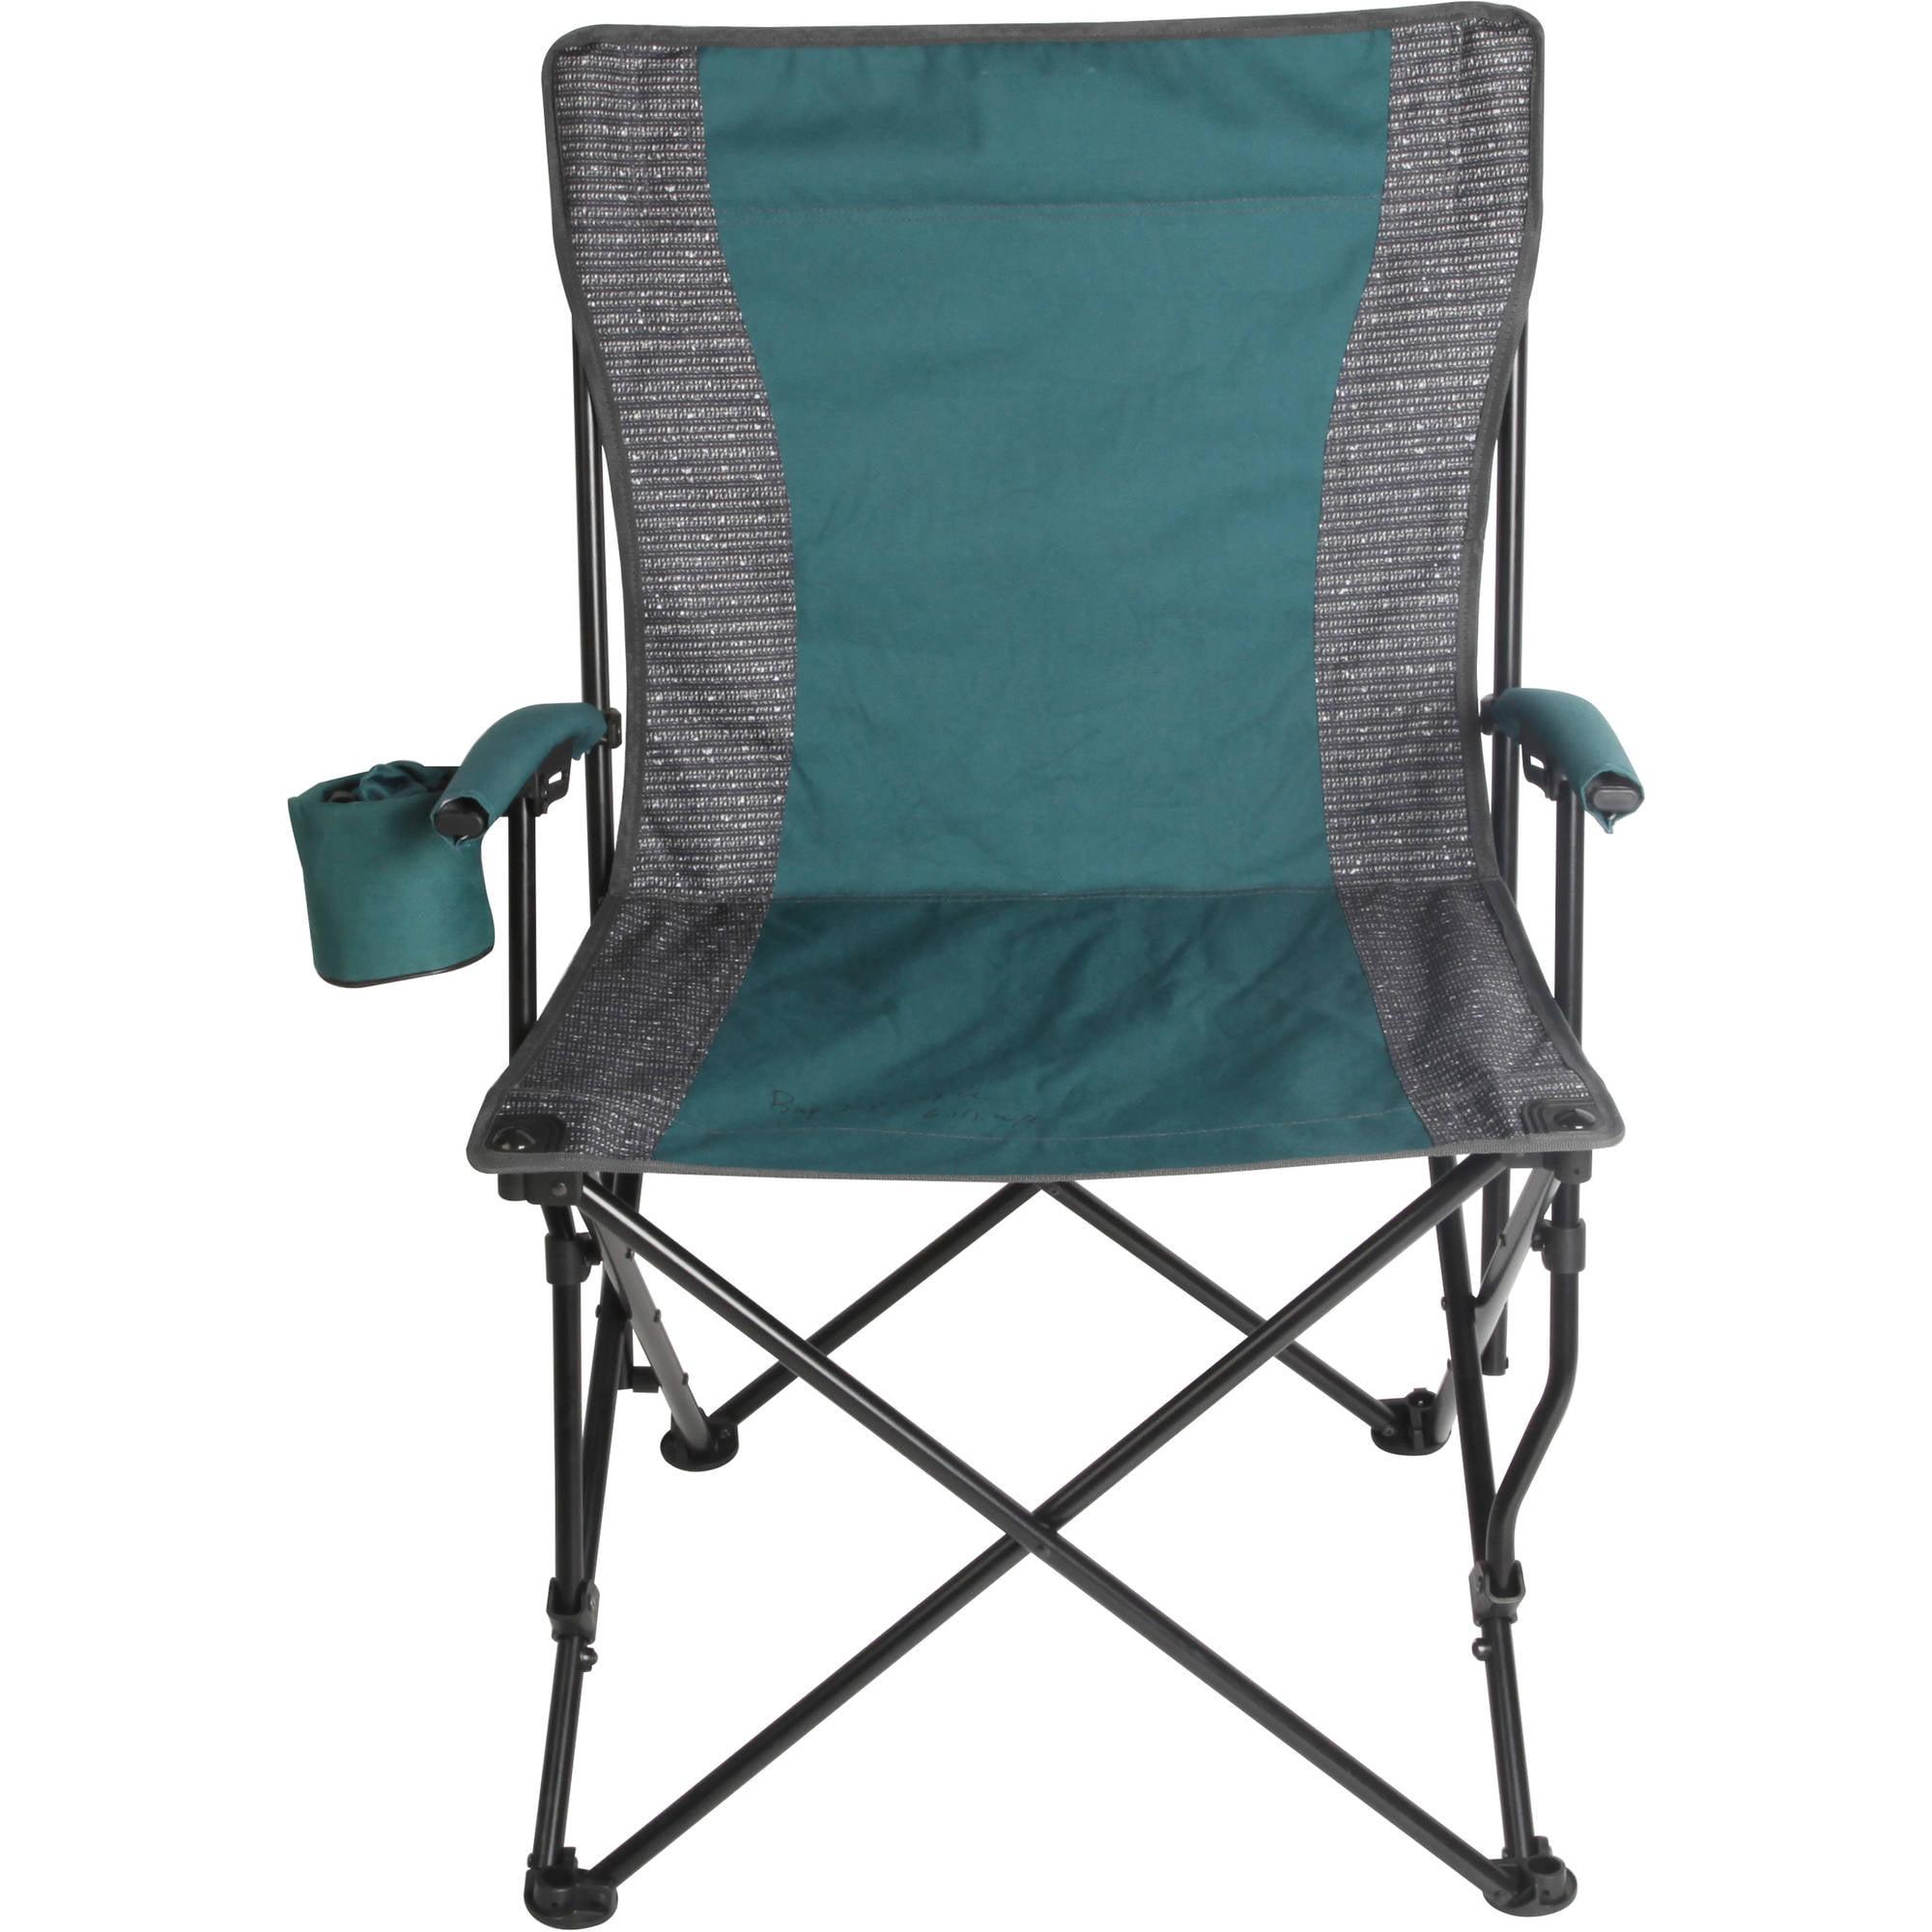 Ozark Trail Quad-Folding Basic Hard Arm Chair with Cup Holder